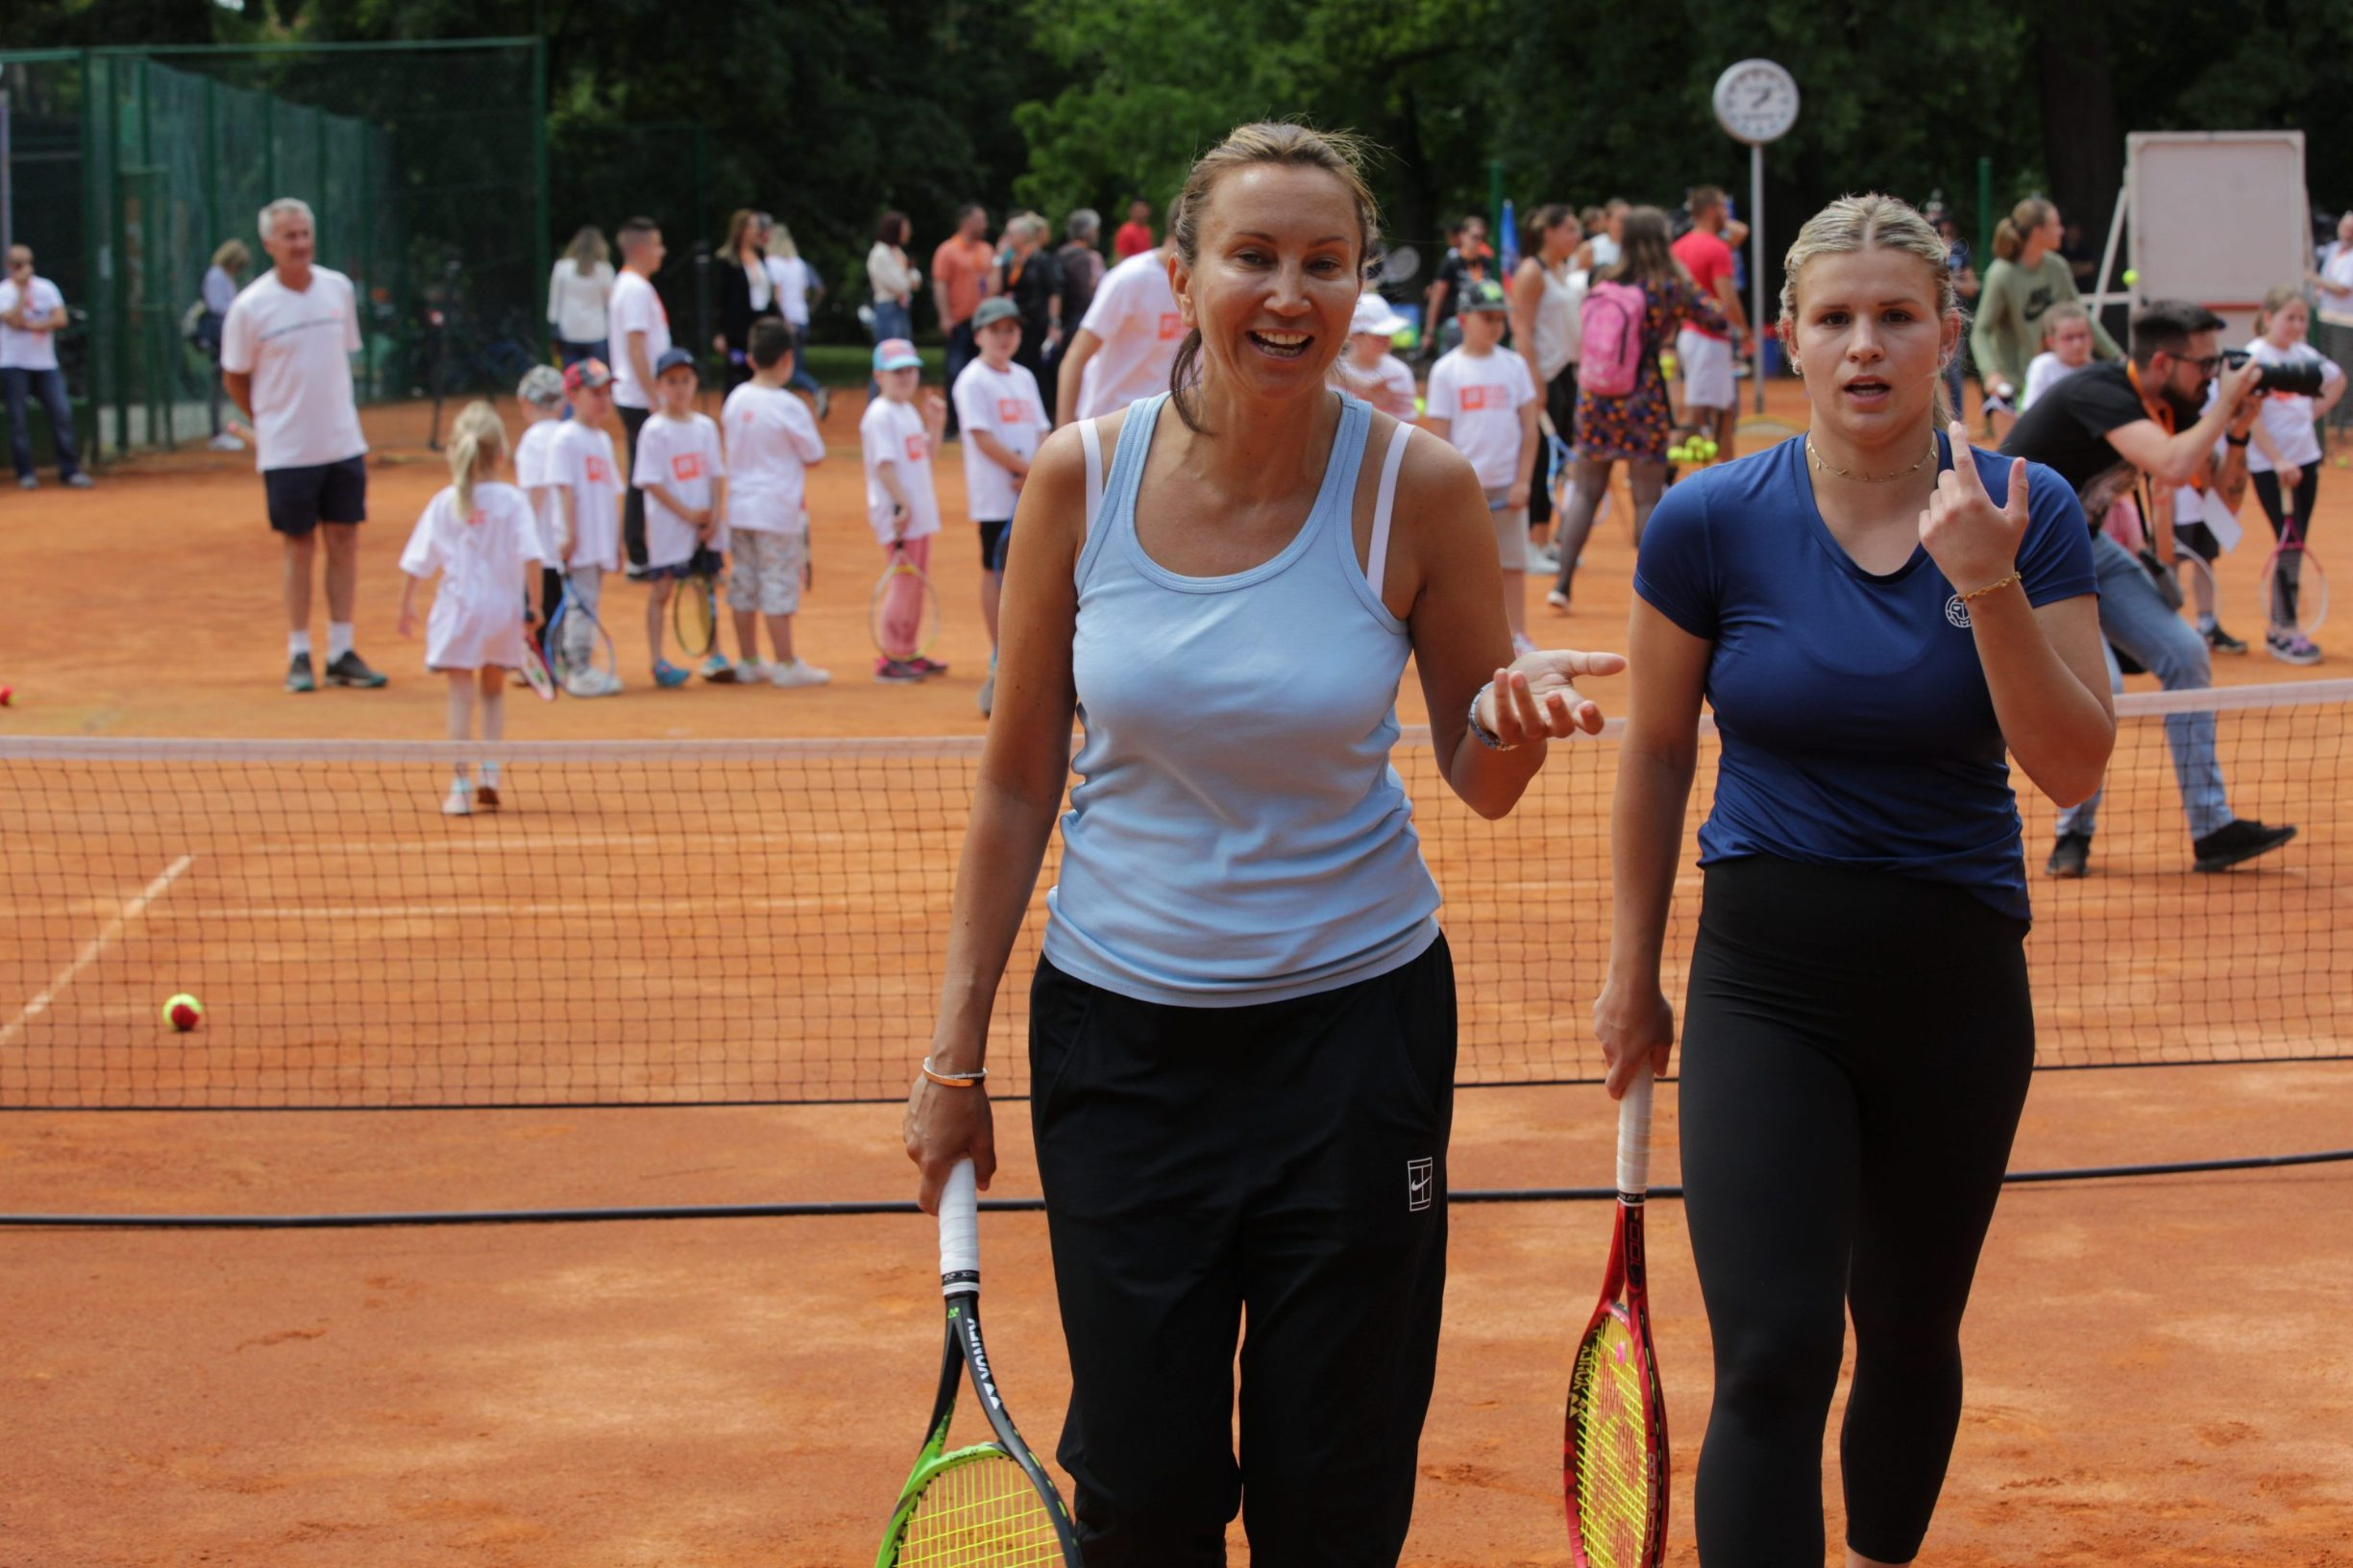 Osijek, 040620. Tenis. Humanitarni turnir Hrvatski premier Tenis. Na fotografiji: Kids Day, Iva Majoli. Foto: Vlado Kos / CROPIX